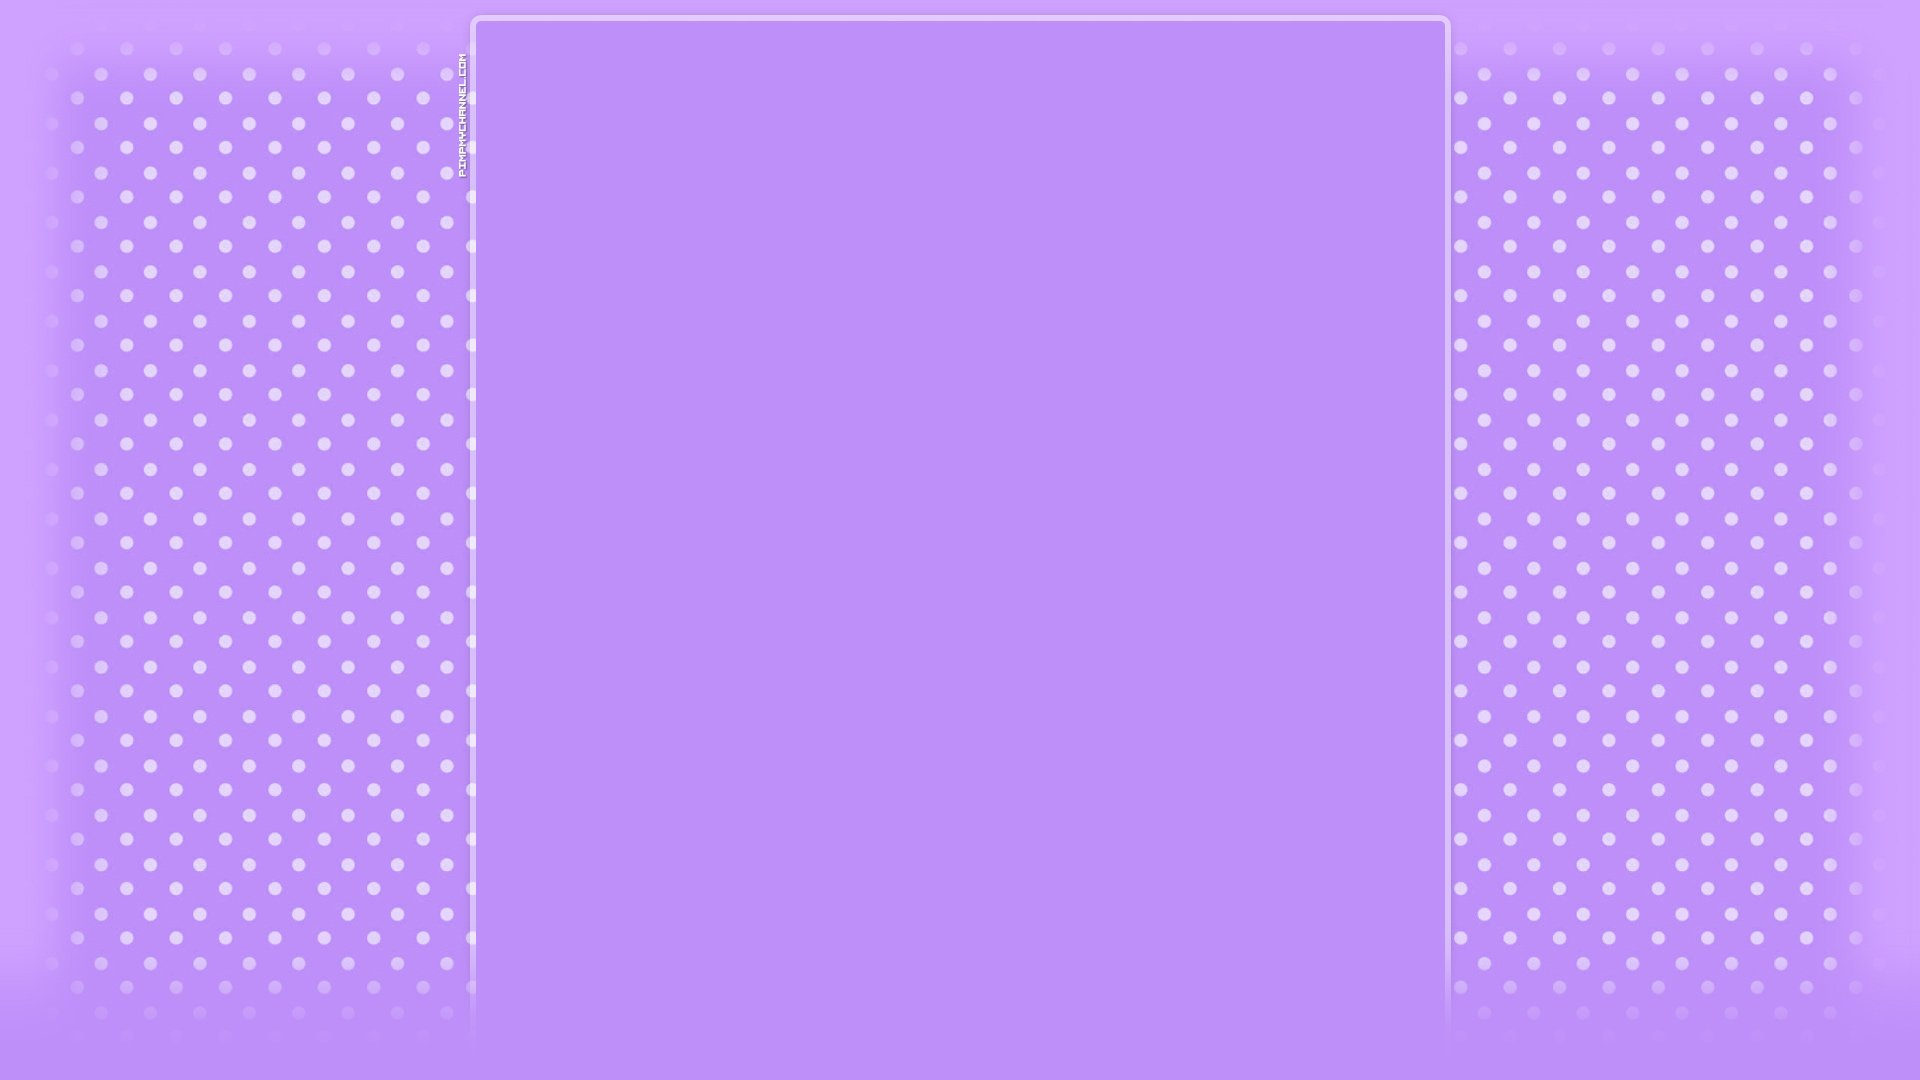 [47+] Cute Polka Dot Wallpaper on WallpaperSafari